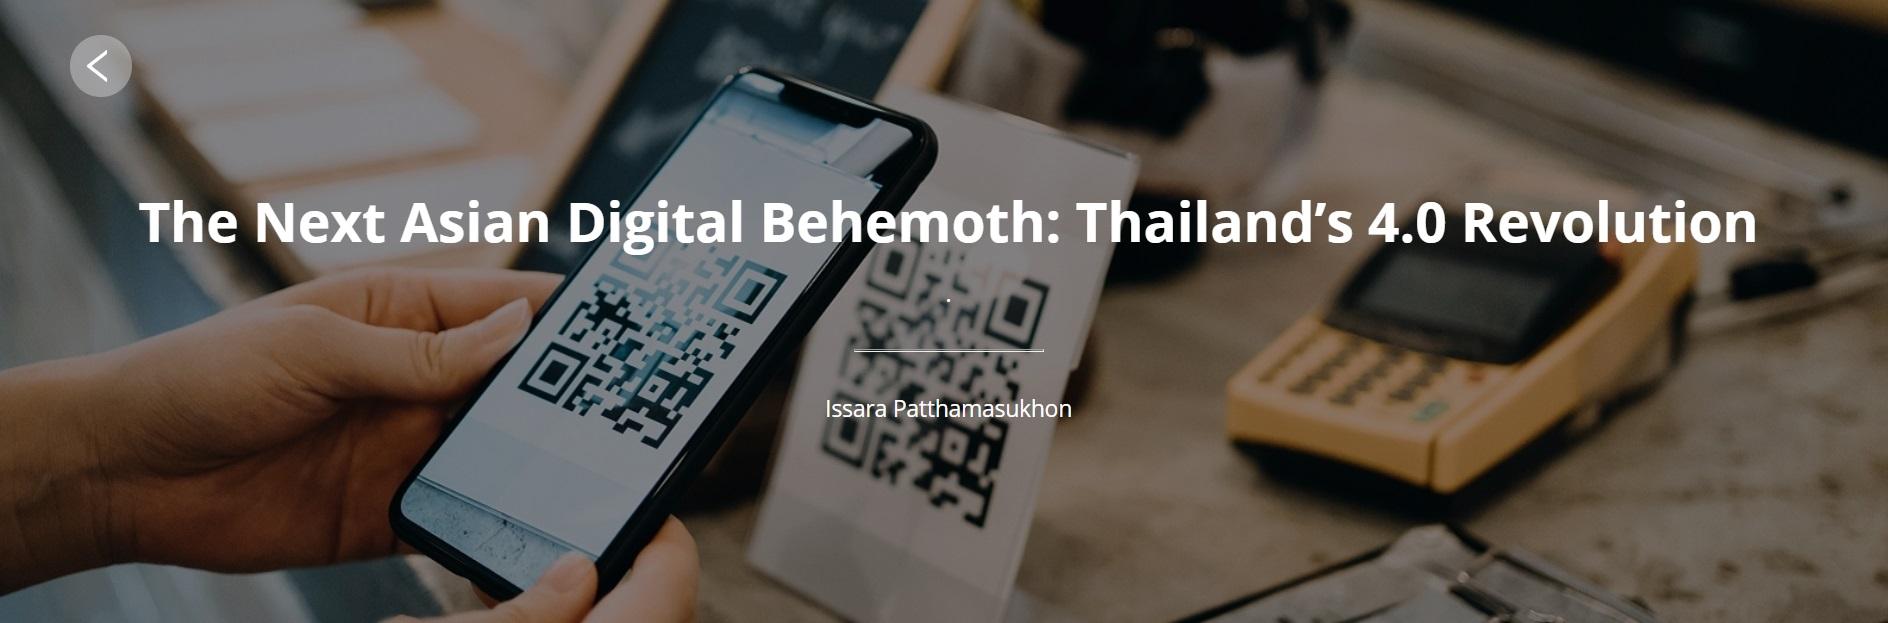 The_Next_Asian_Digital_Behemoth